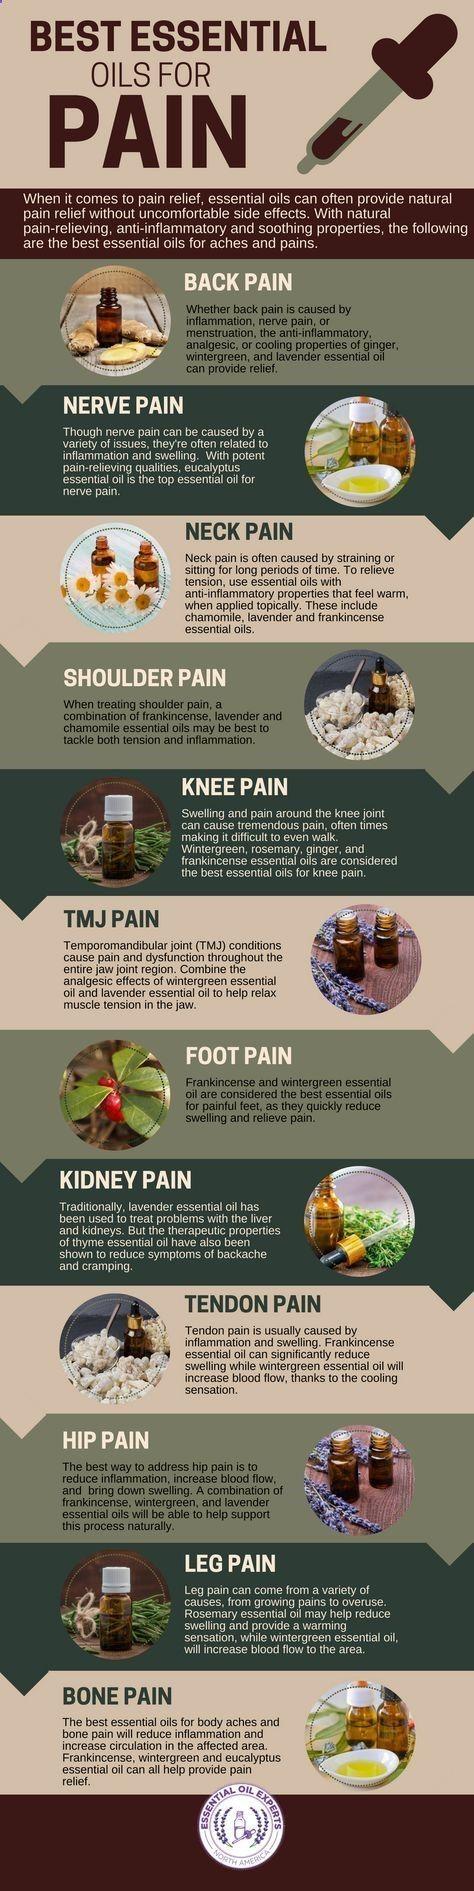 Arthritis Remedies Hands Natural Cures - Best Essential Oils for Pain Management - Back, Nerve, Neck, Shoulder  Knee - Arthritis Remedies Hands Natural Cures